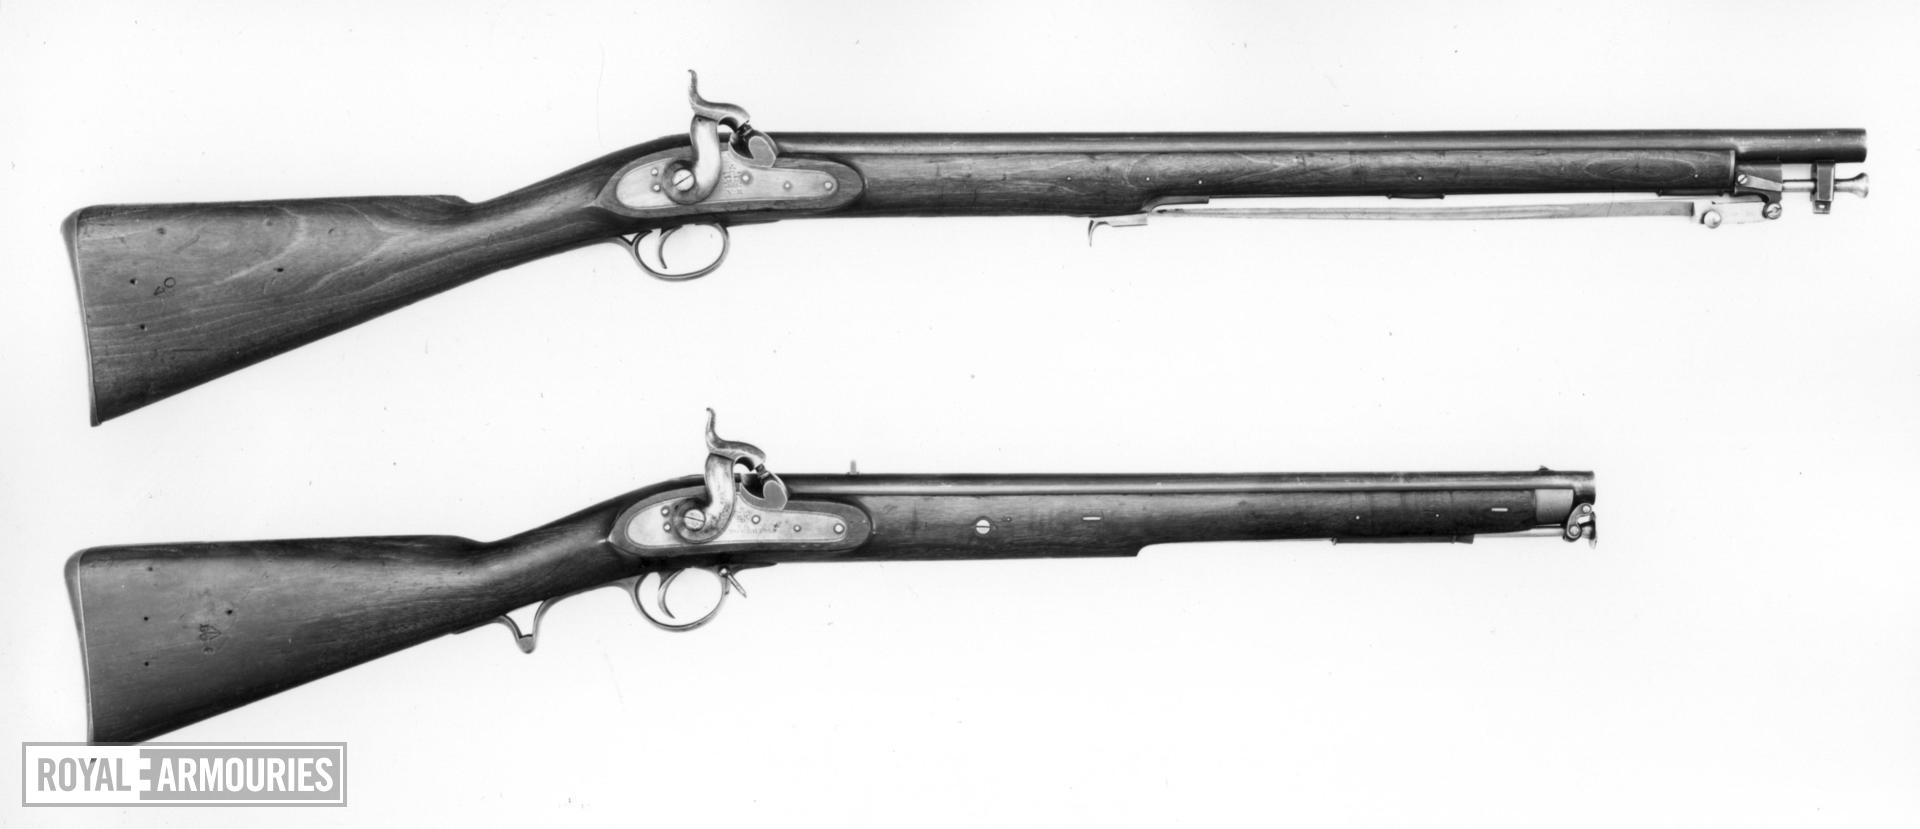 Percussion muzzle-loading carbine - English Carbine. For constabulary.